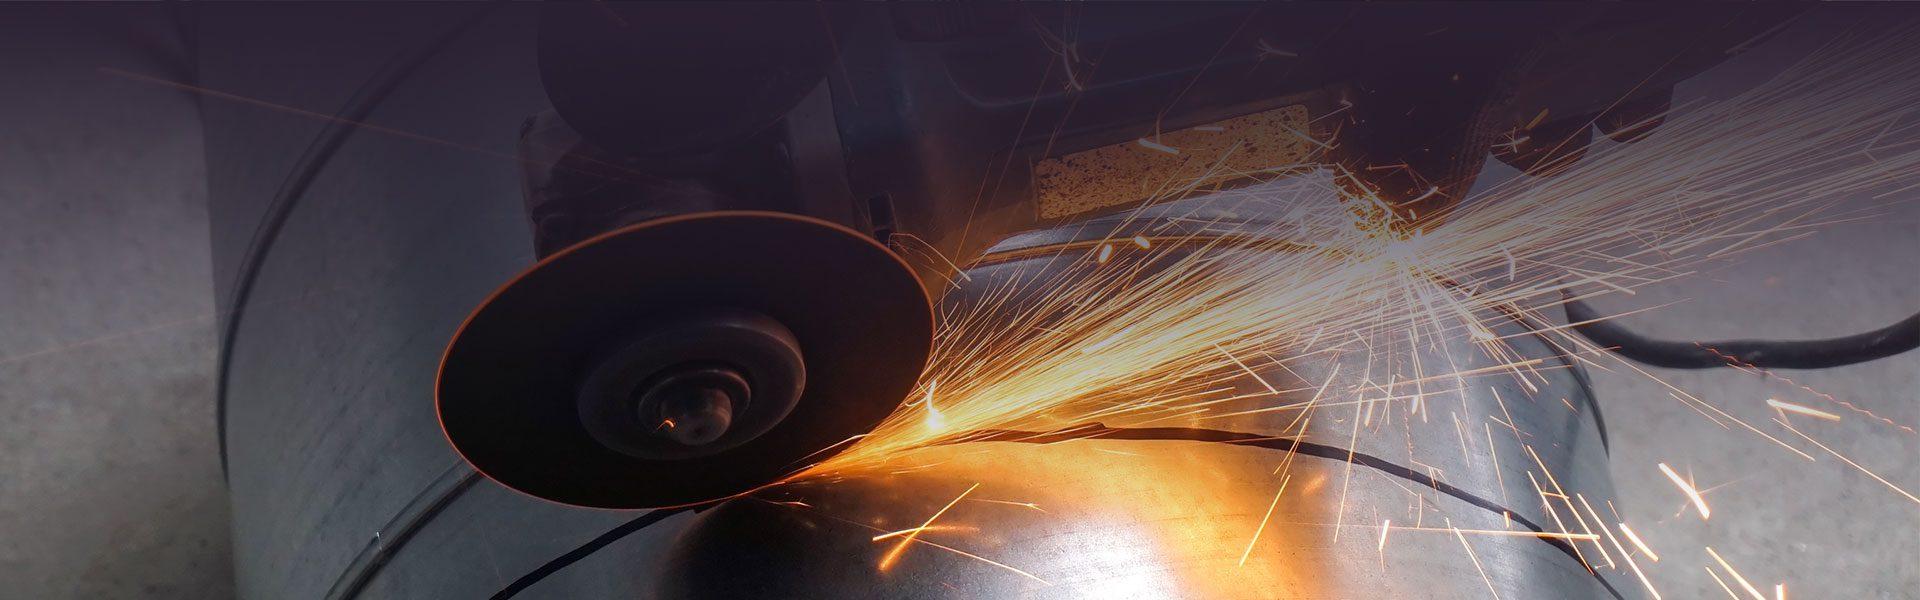 Abrasive Wheel Training Baf Accredited Training Testing Services